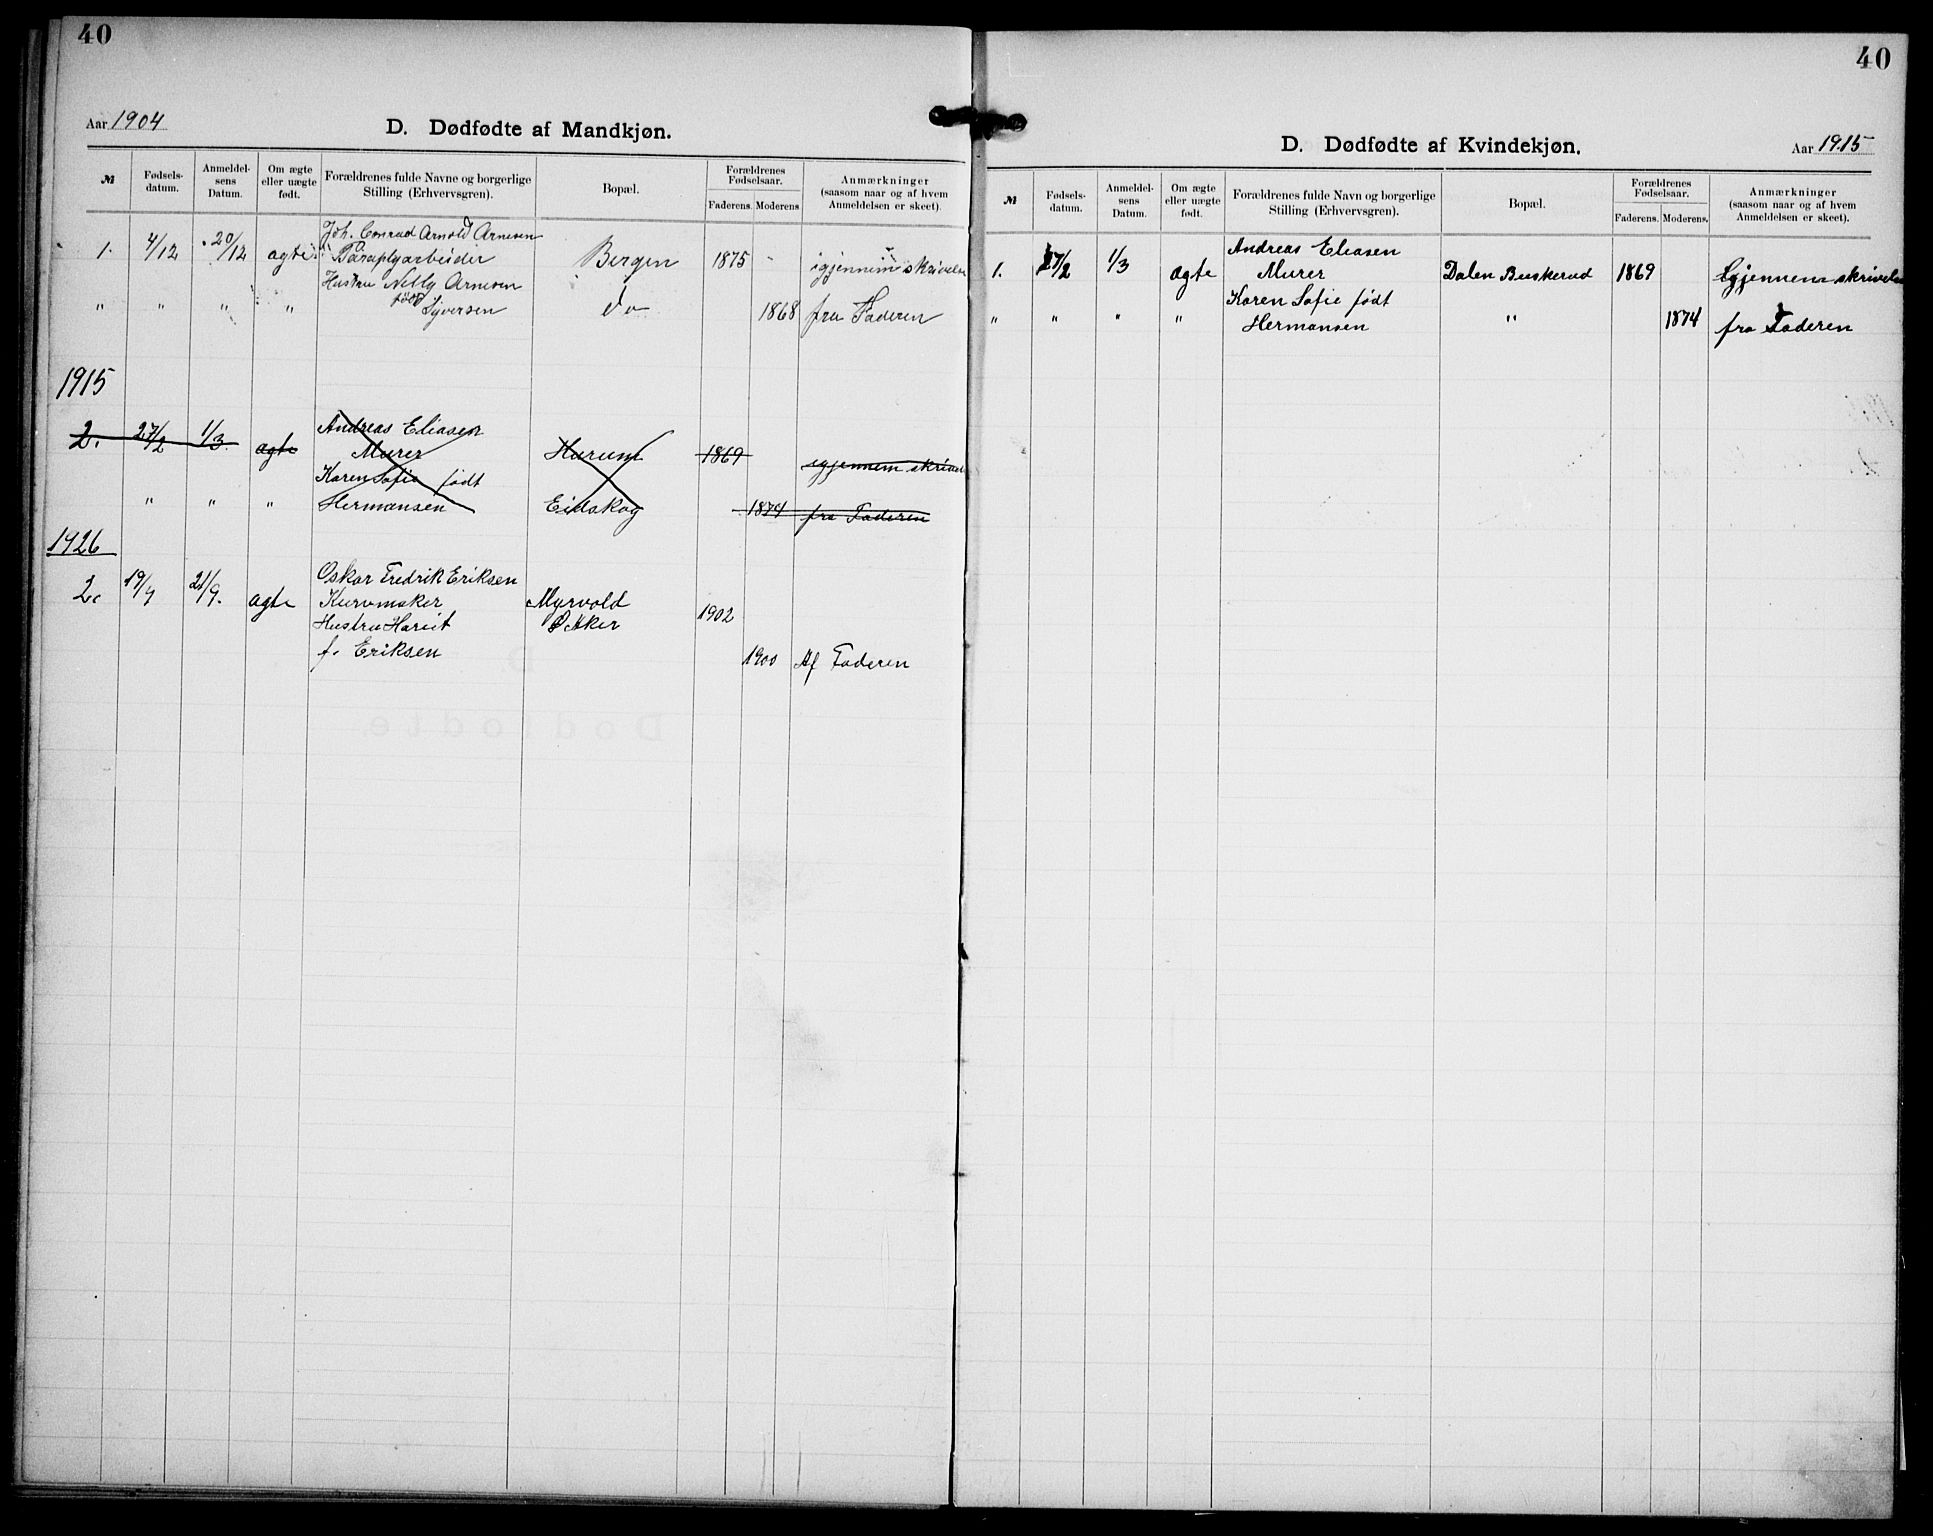 SAO, Kristi menighet Oslo , A/L0001: Dissenterprotokoll nr. 1, 1903-1938, s. 40